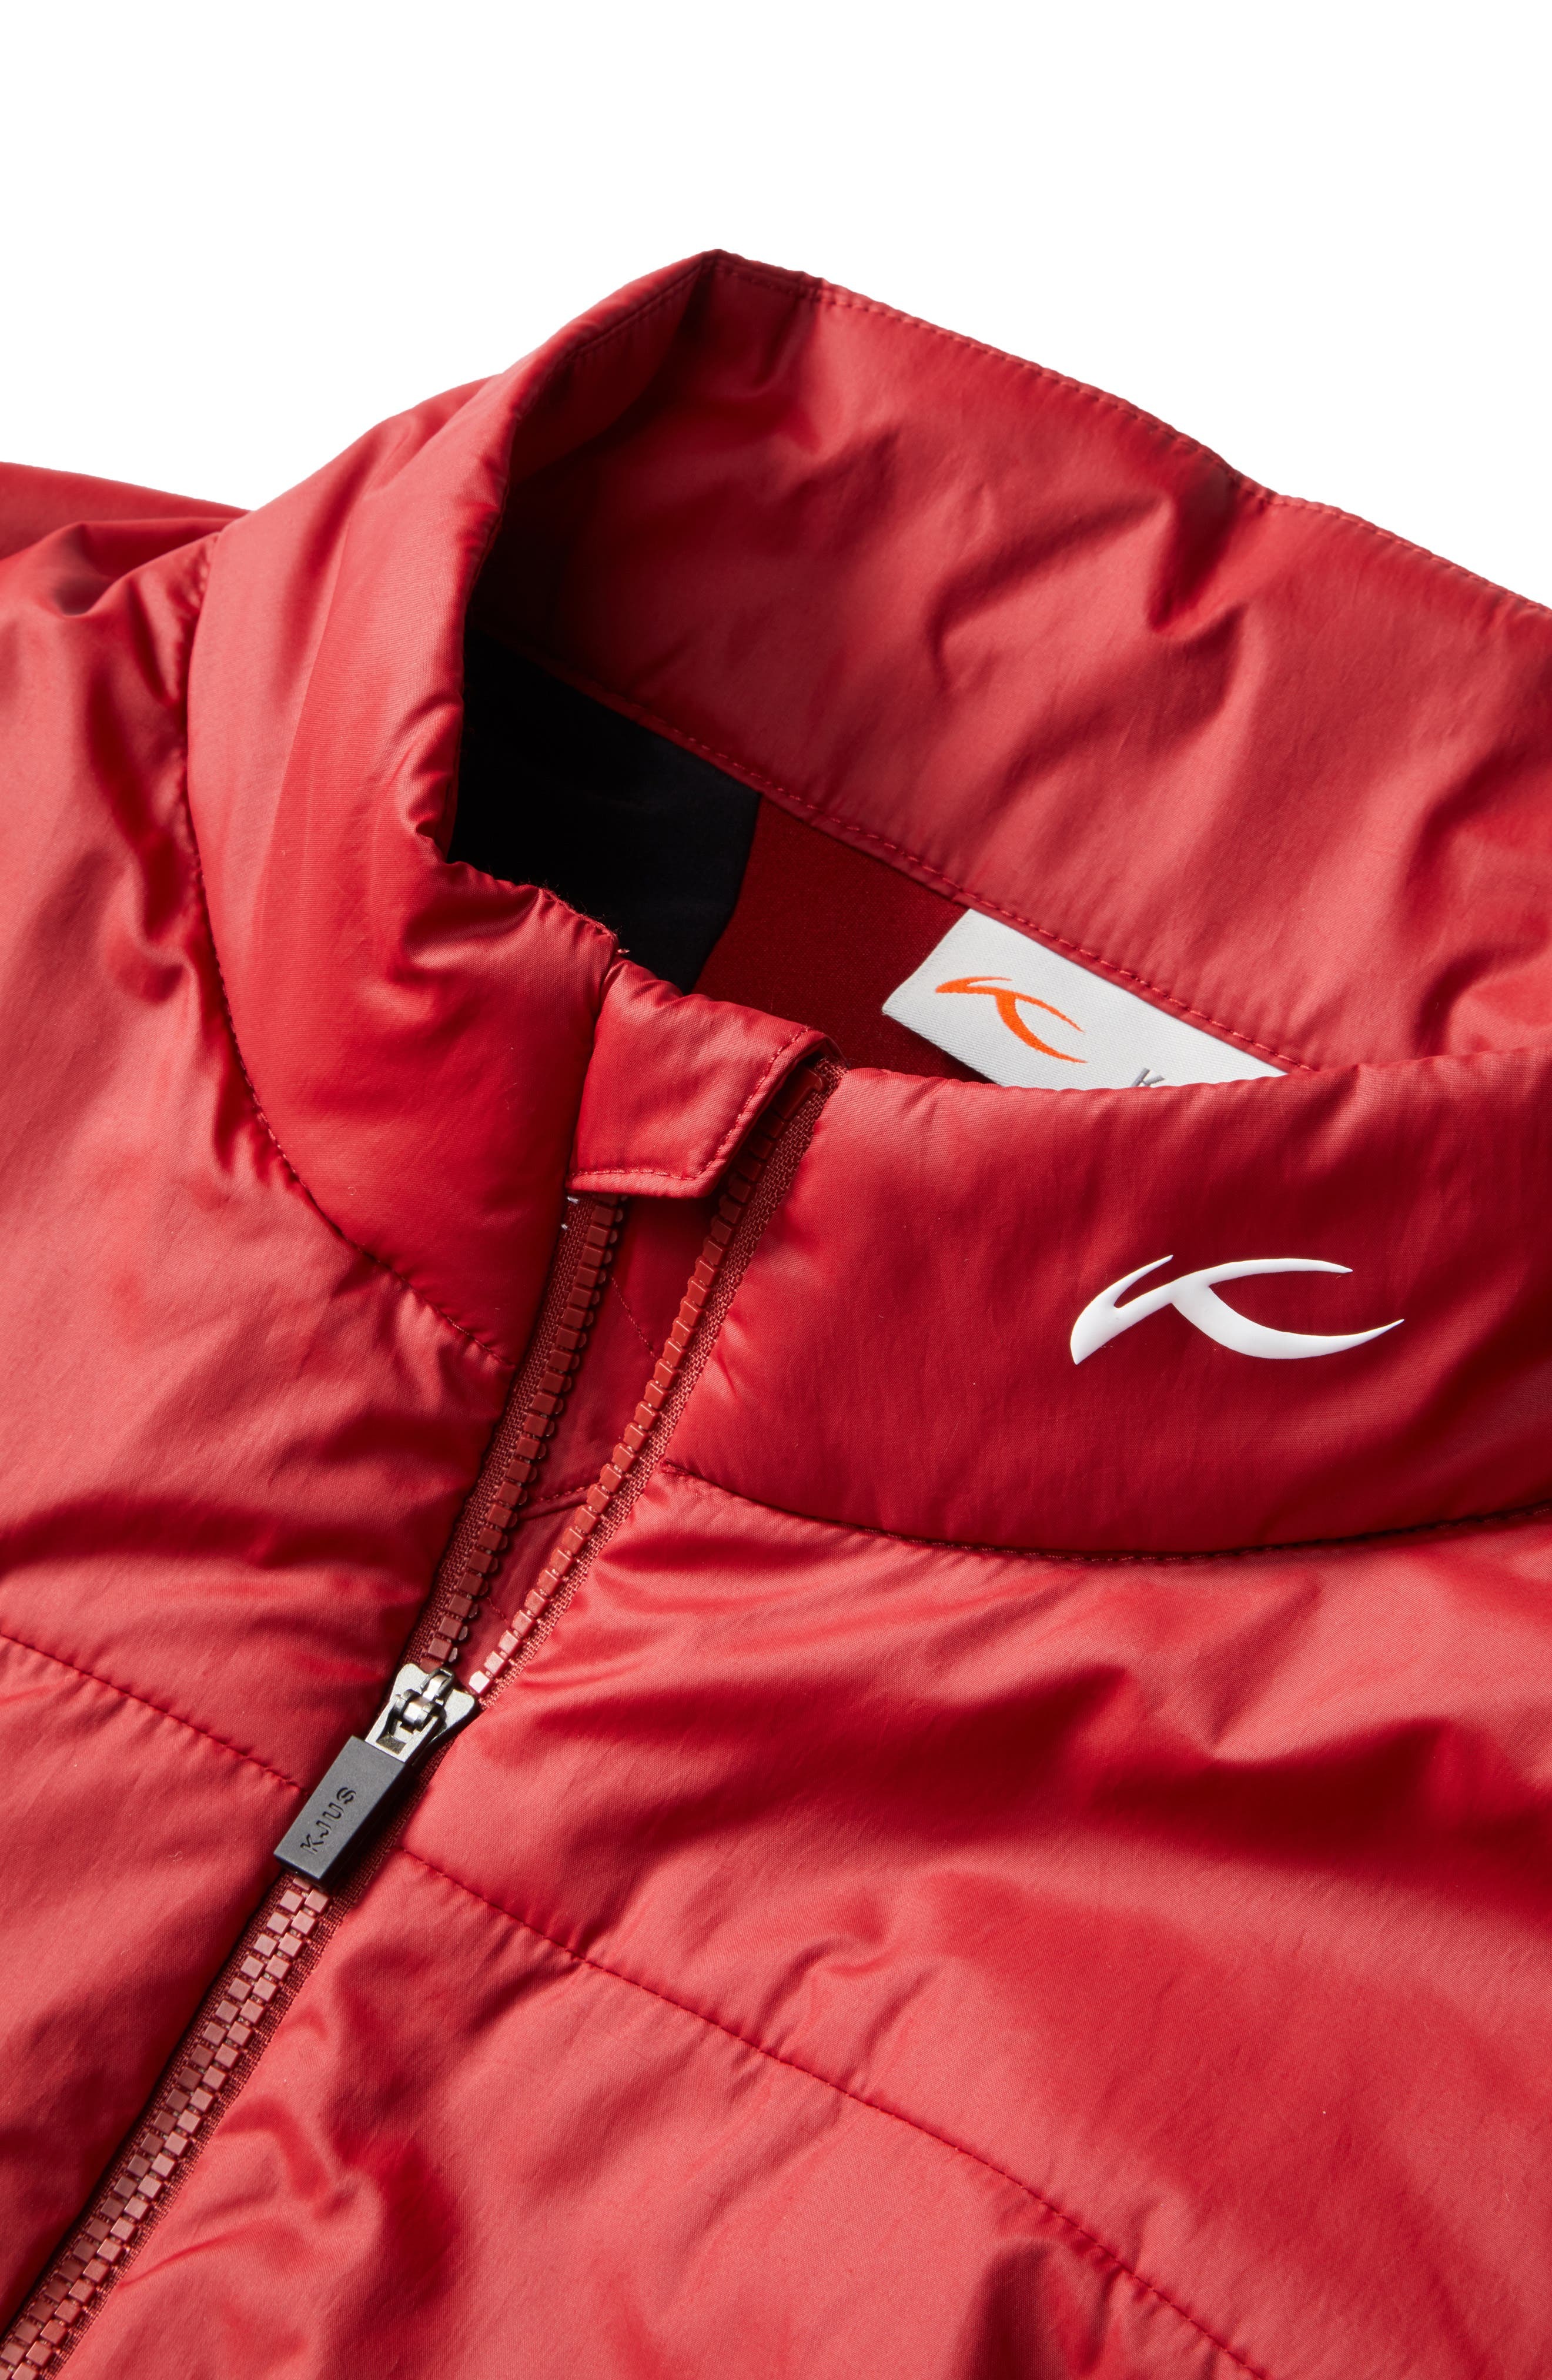 Radiation Waterproof Jacket,                             Alternate thumbnail 6, color,                             RED DAHLIA